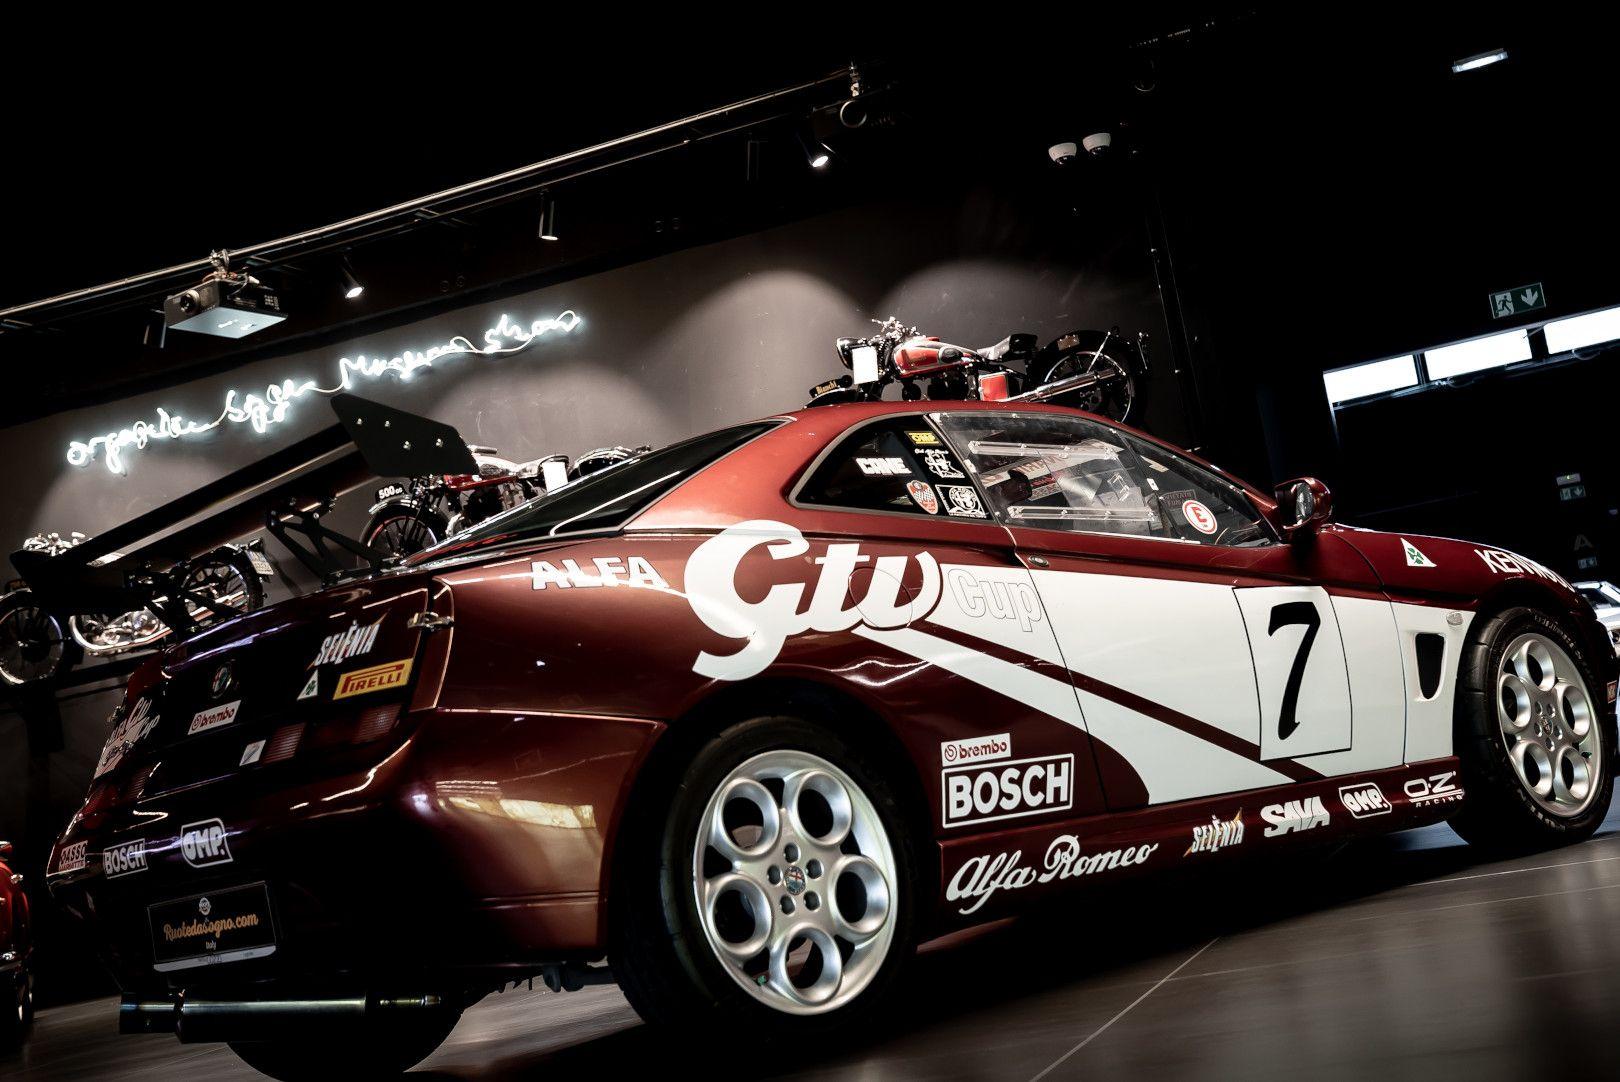 1995 Alfa Romeo GTV 2.0 V6 Turbo Cup Replica 57180